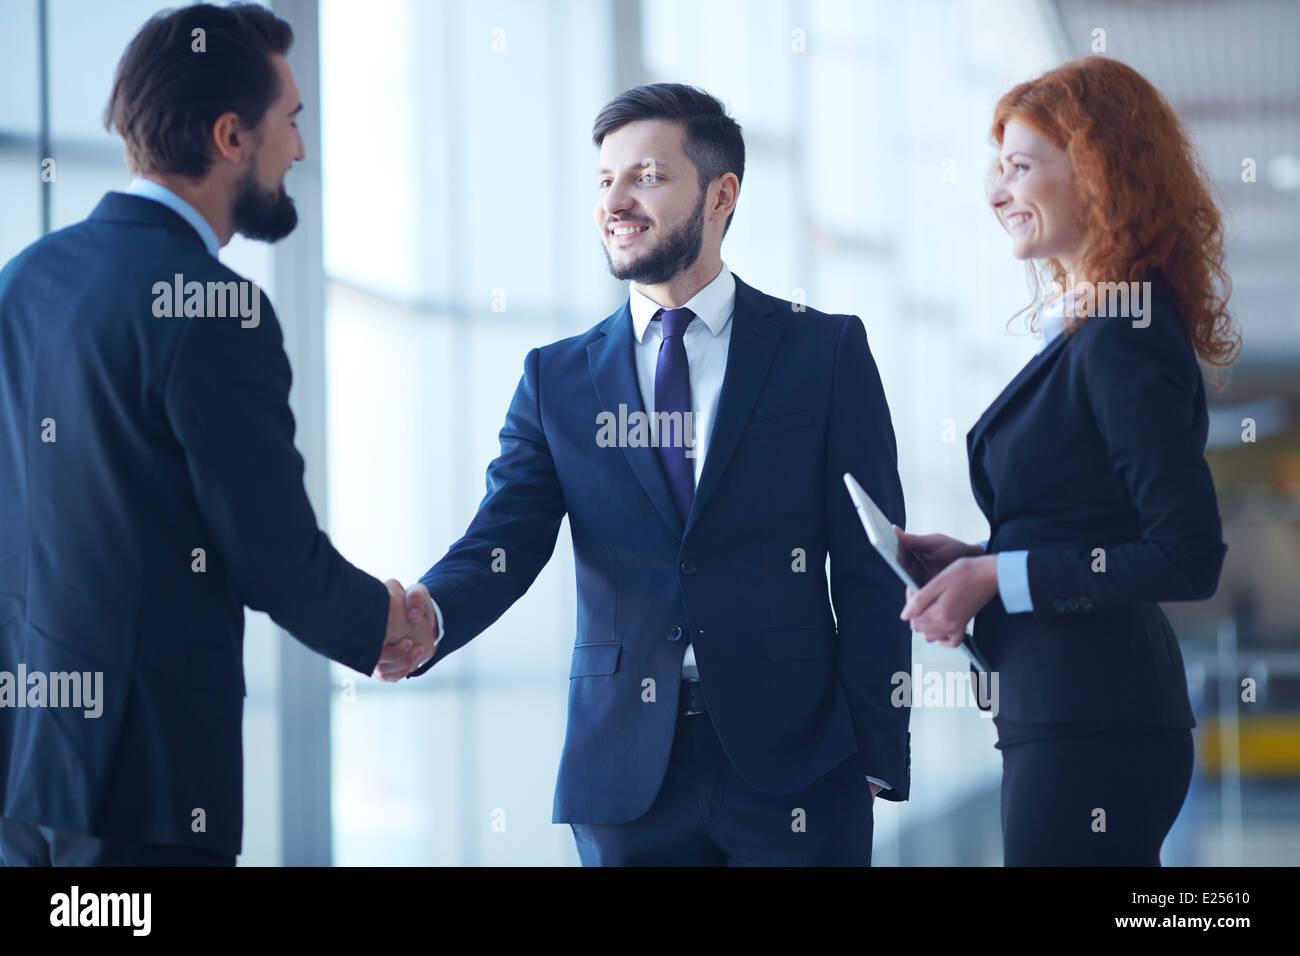 Two businessmen handshaking after striking grand deal - Stock Image